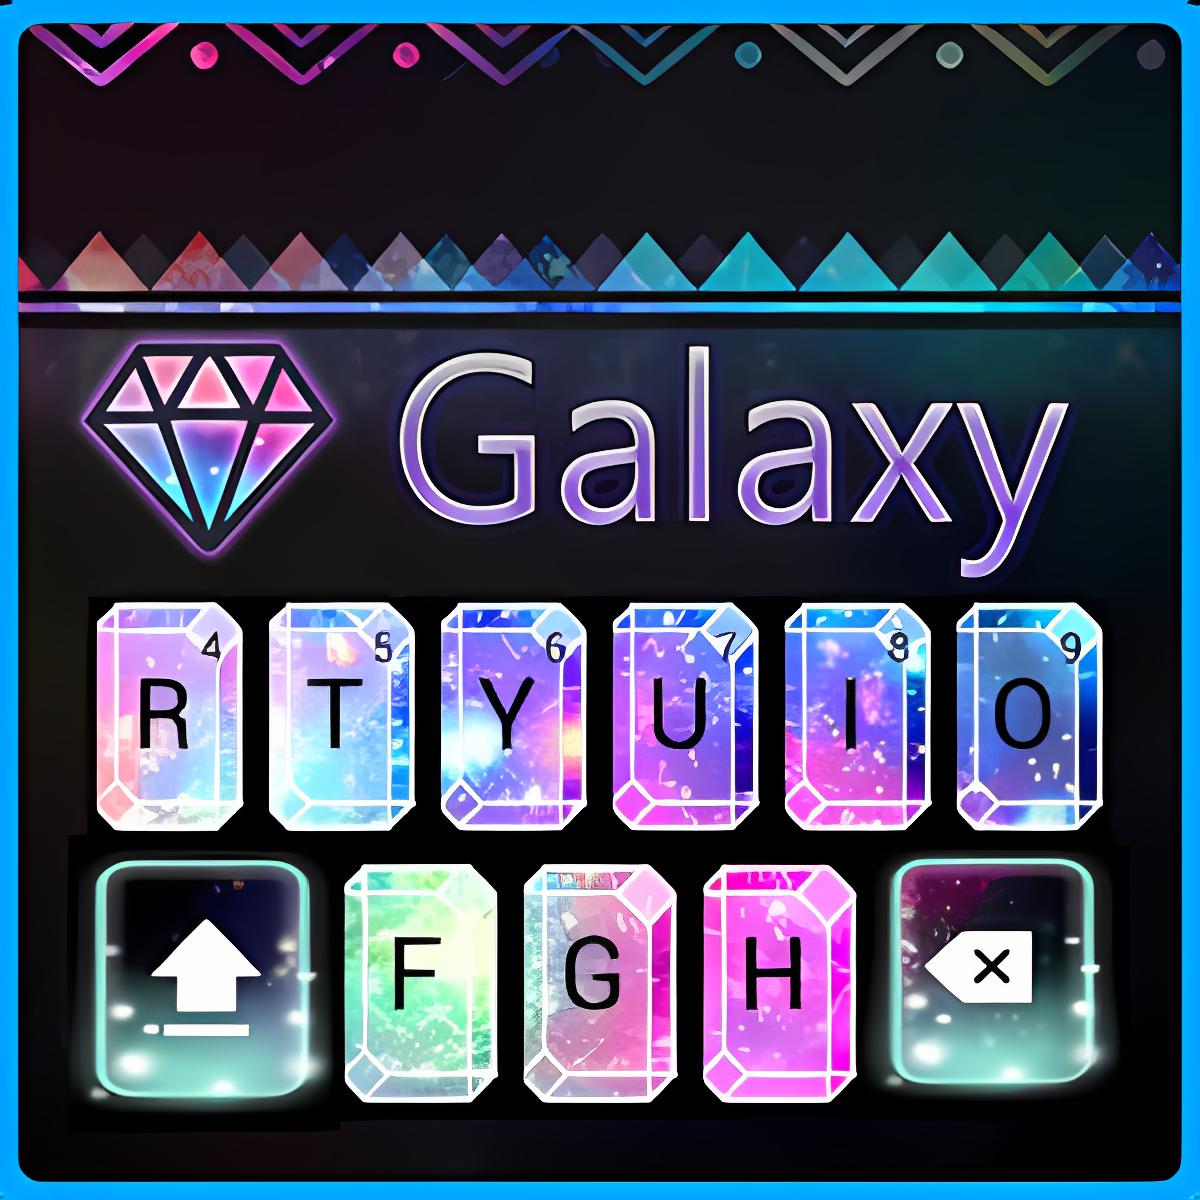 Galaxy panda keyboard 10001005